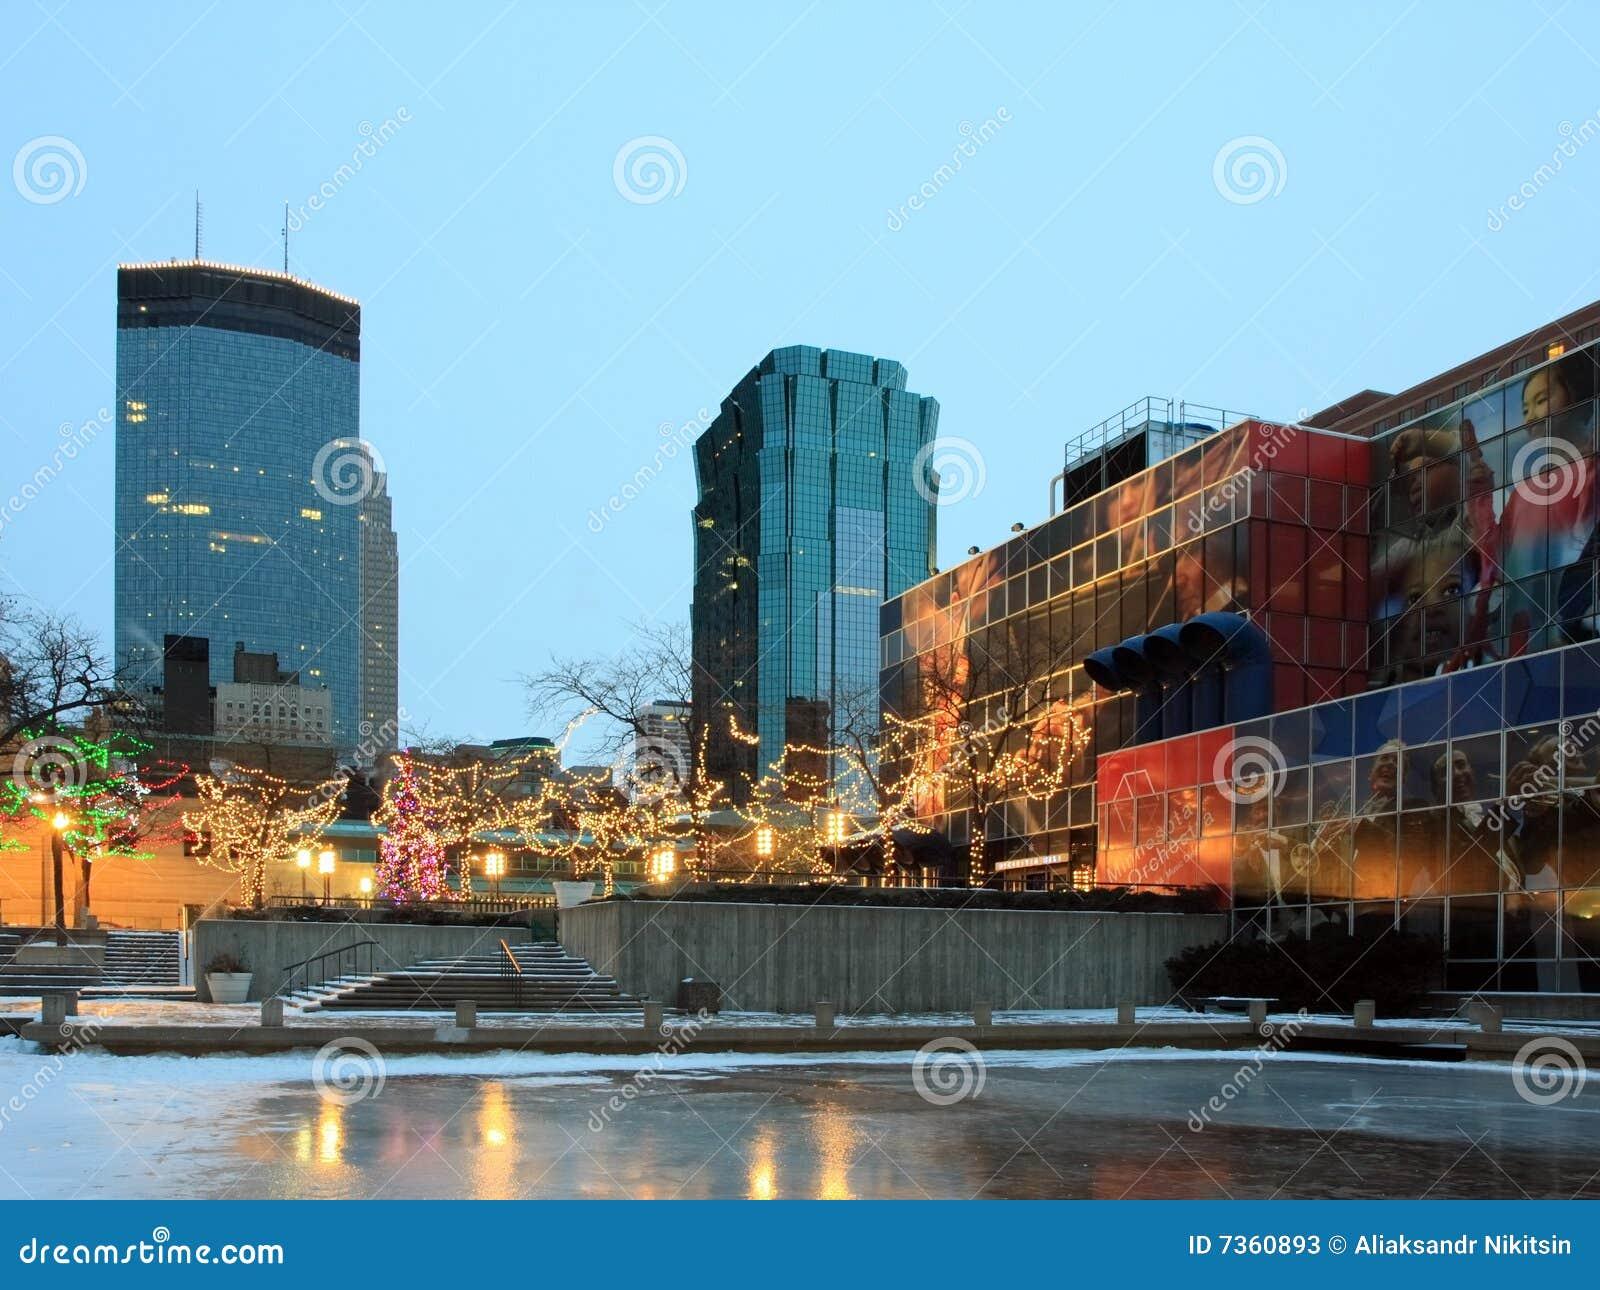 christmas decoration downtown minneapolis - Christmas Lights Minneapolis